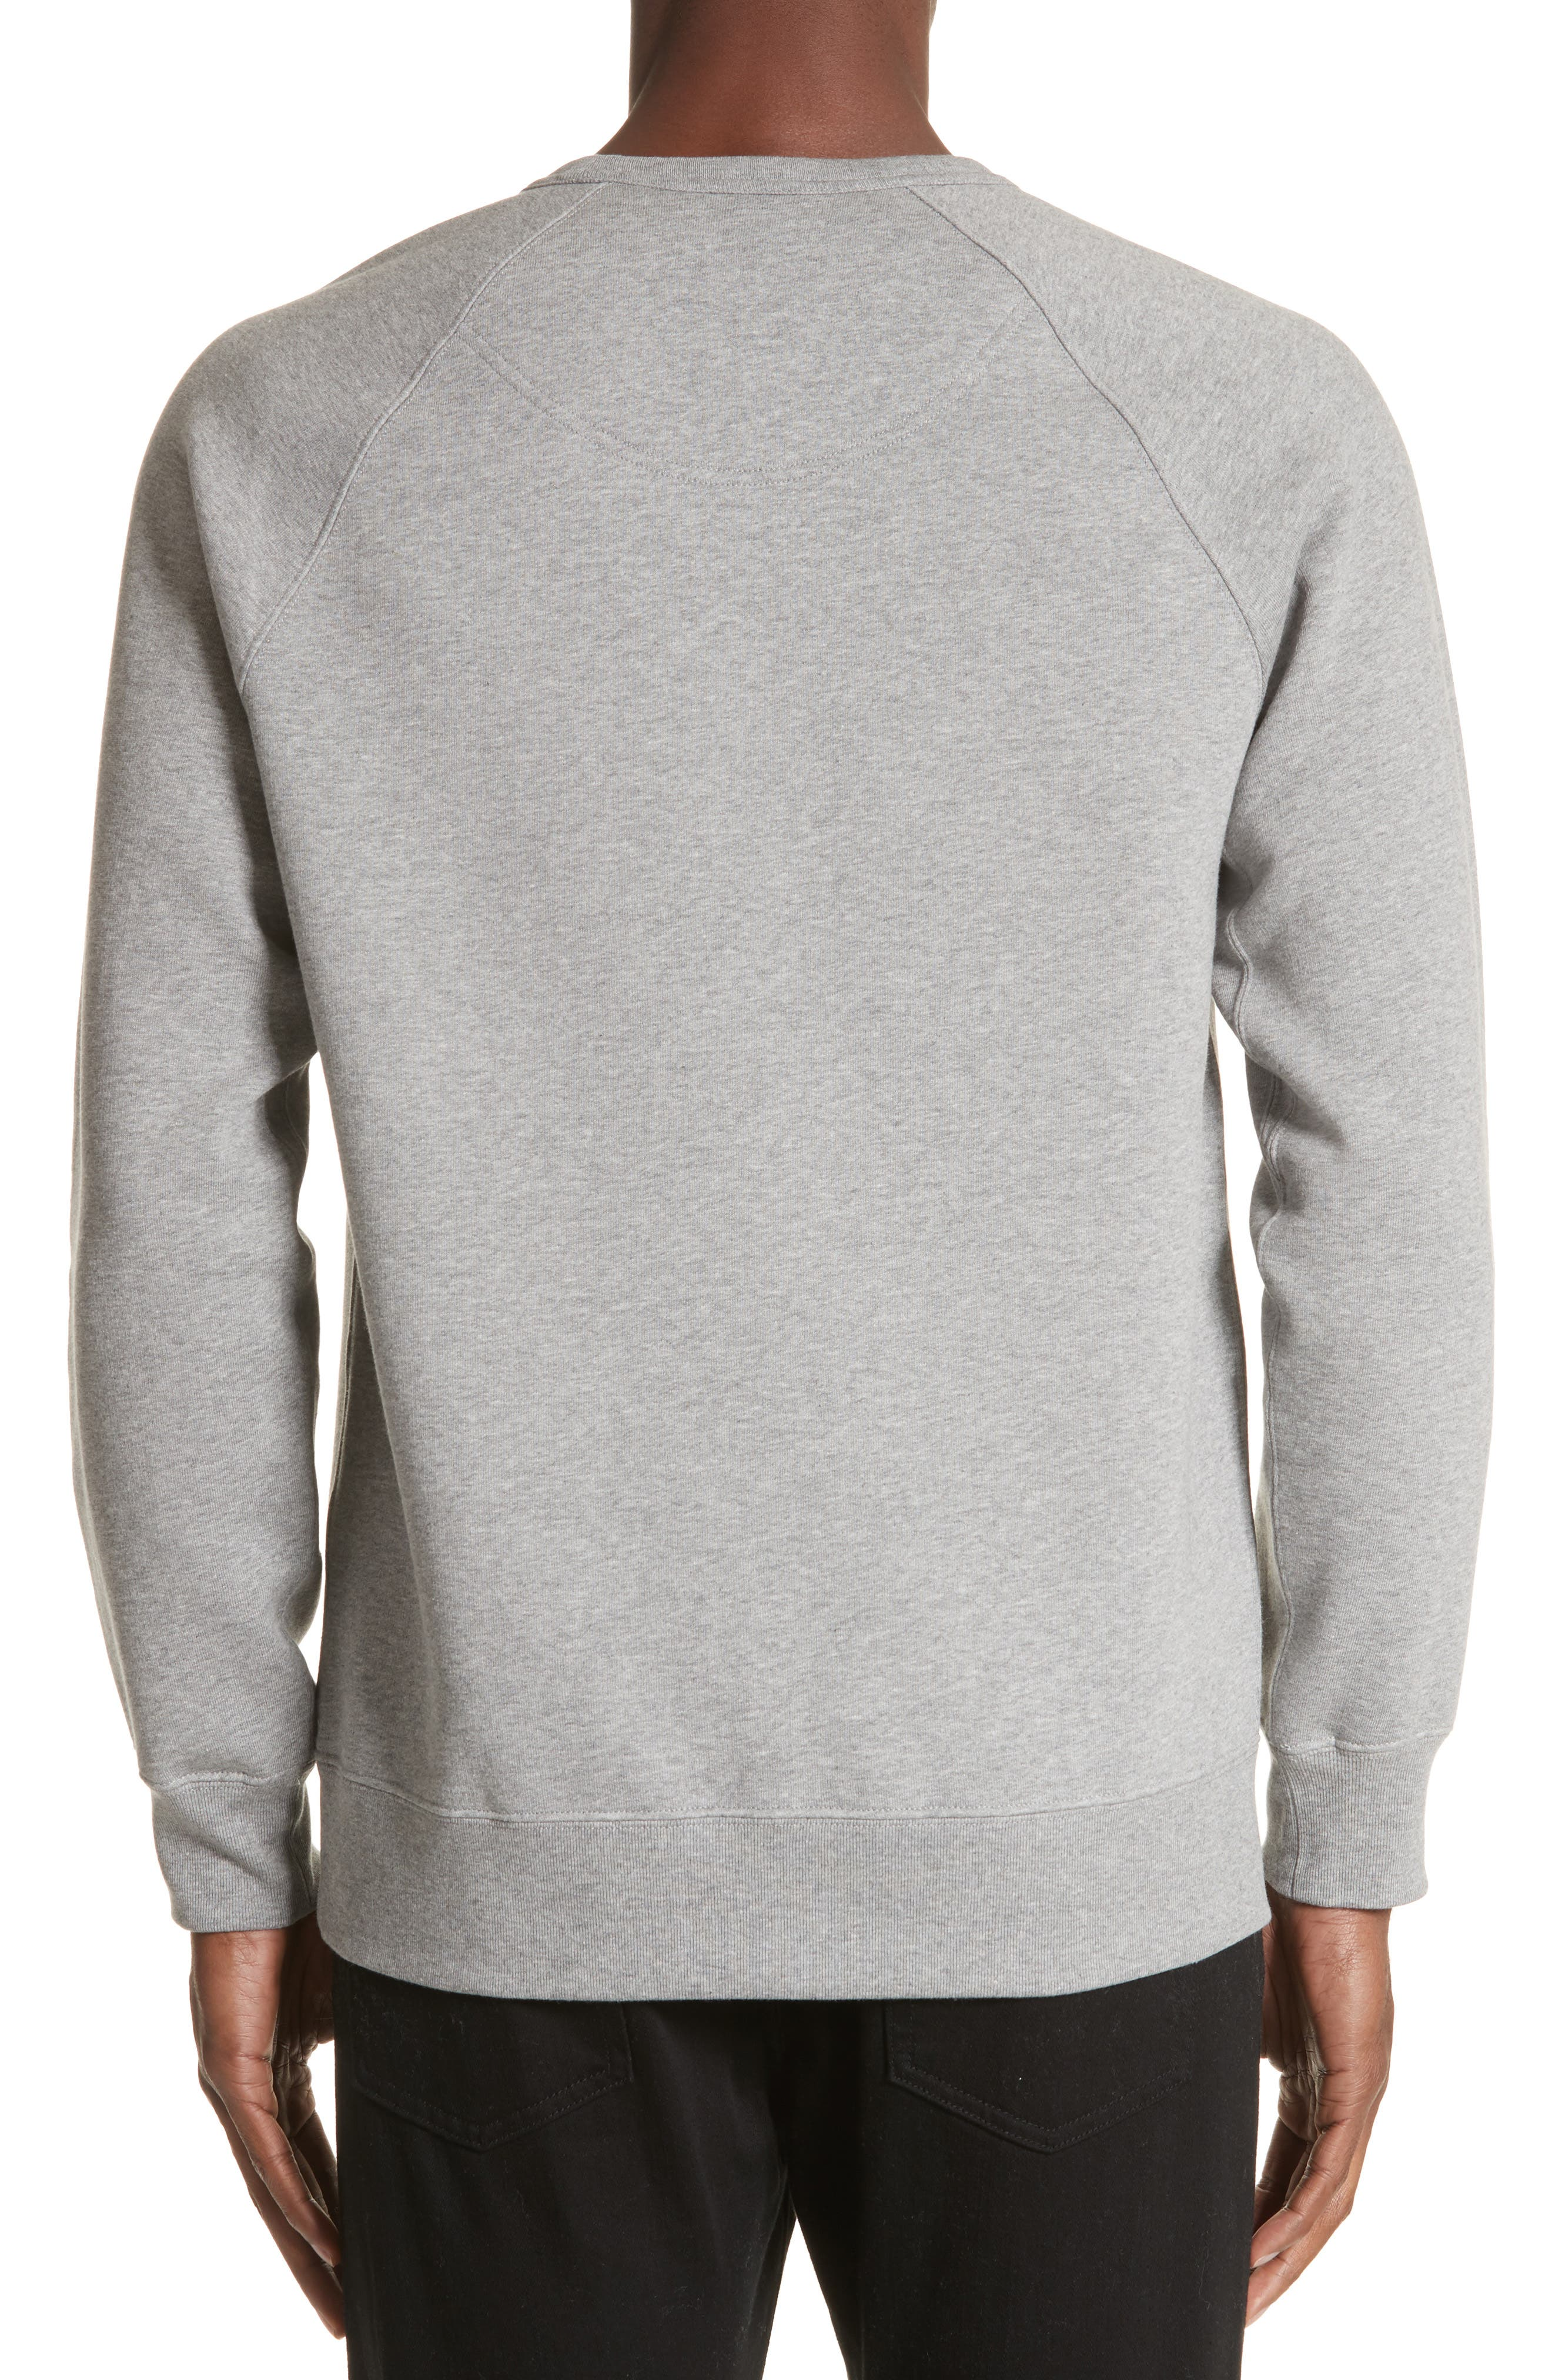 Kaneford Standard Fit Sweatshirt,                             Alternate thumbnail 2, color,                             Pale Grey Melange